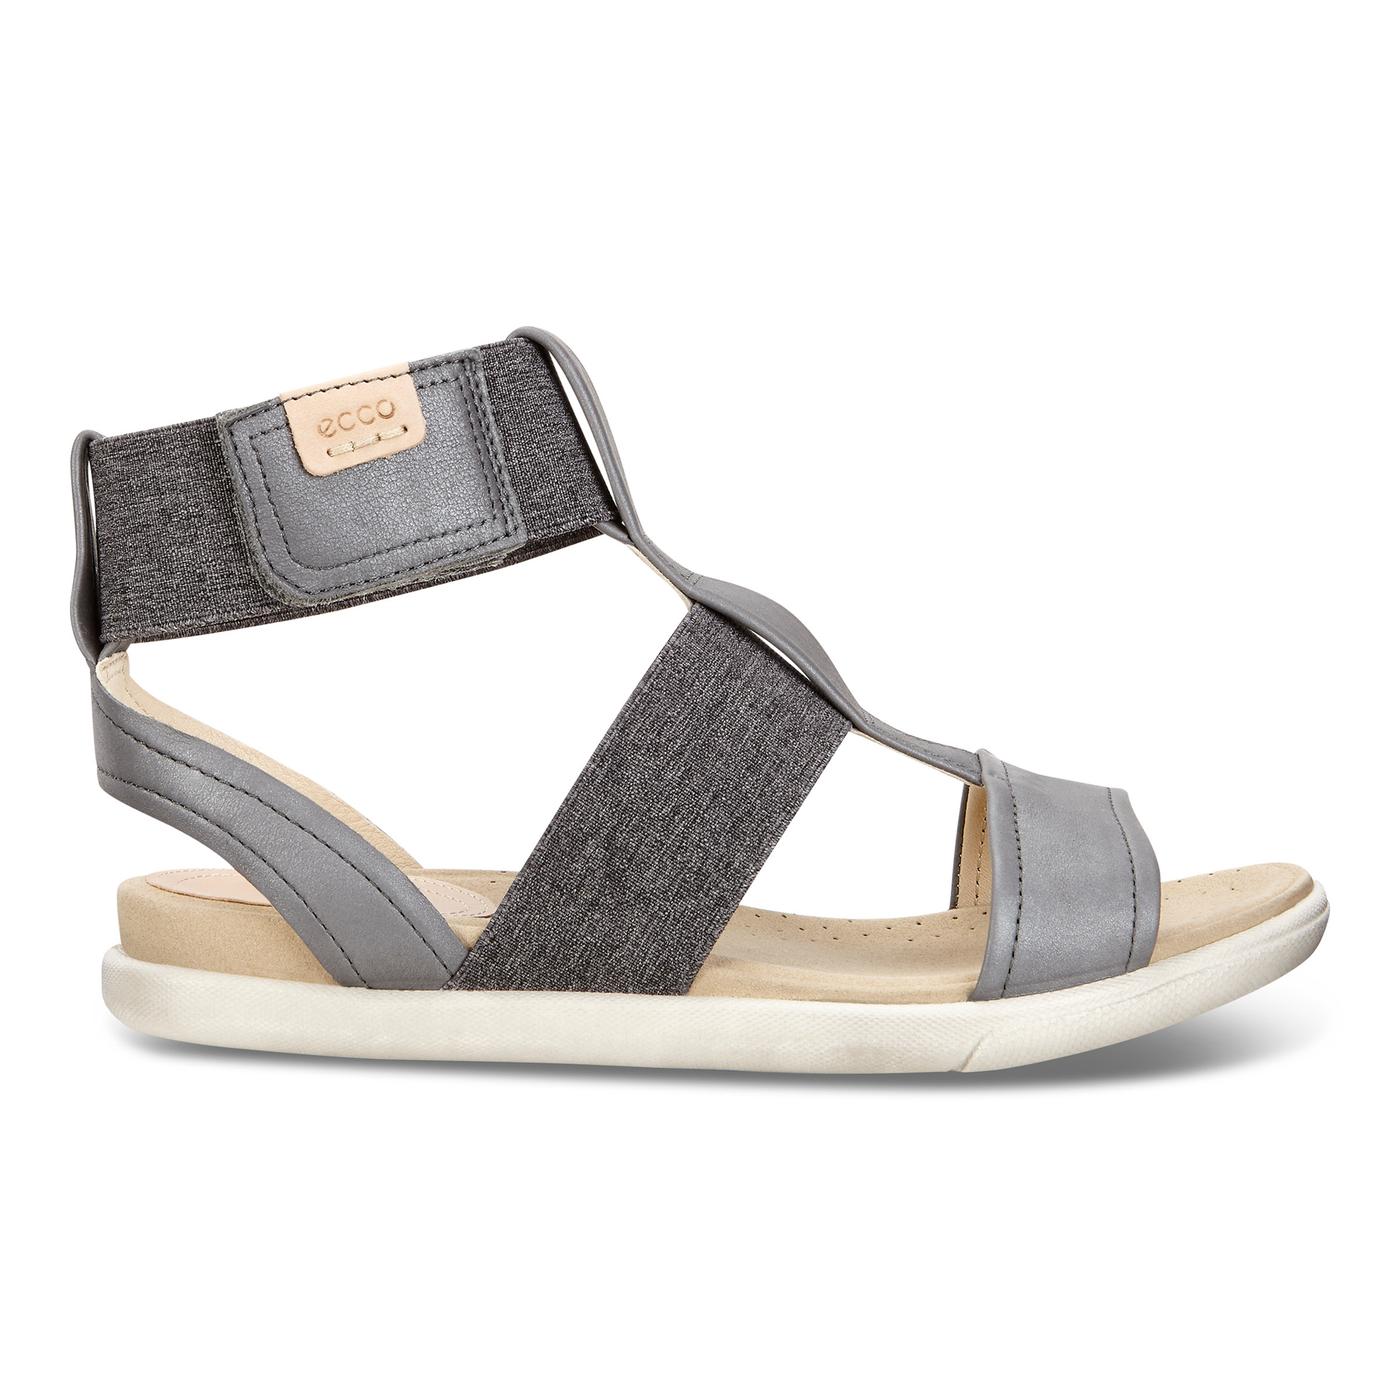 ECCO Damara Ankle Strap Sandal